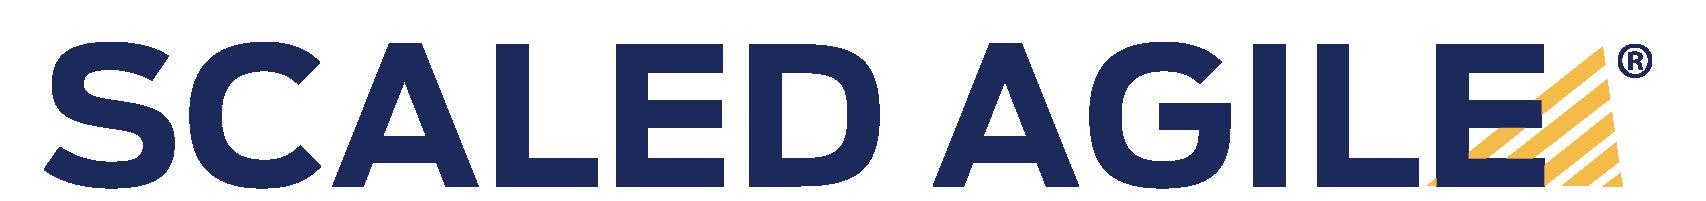 scaled-agile-logo.png